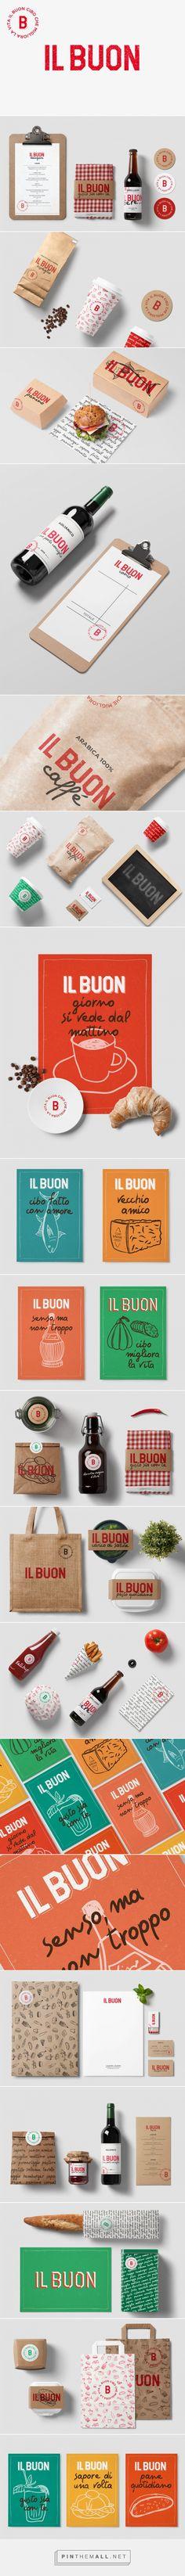 Logo e Branding Ristorante Il BUON | Bocanegra Design Studio  bocanegrastudio.com  #branding #identity #brandidentity #logodesign #logo #naming #graphicdesign #restaurantbranding